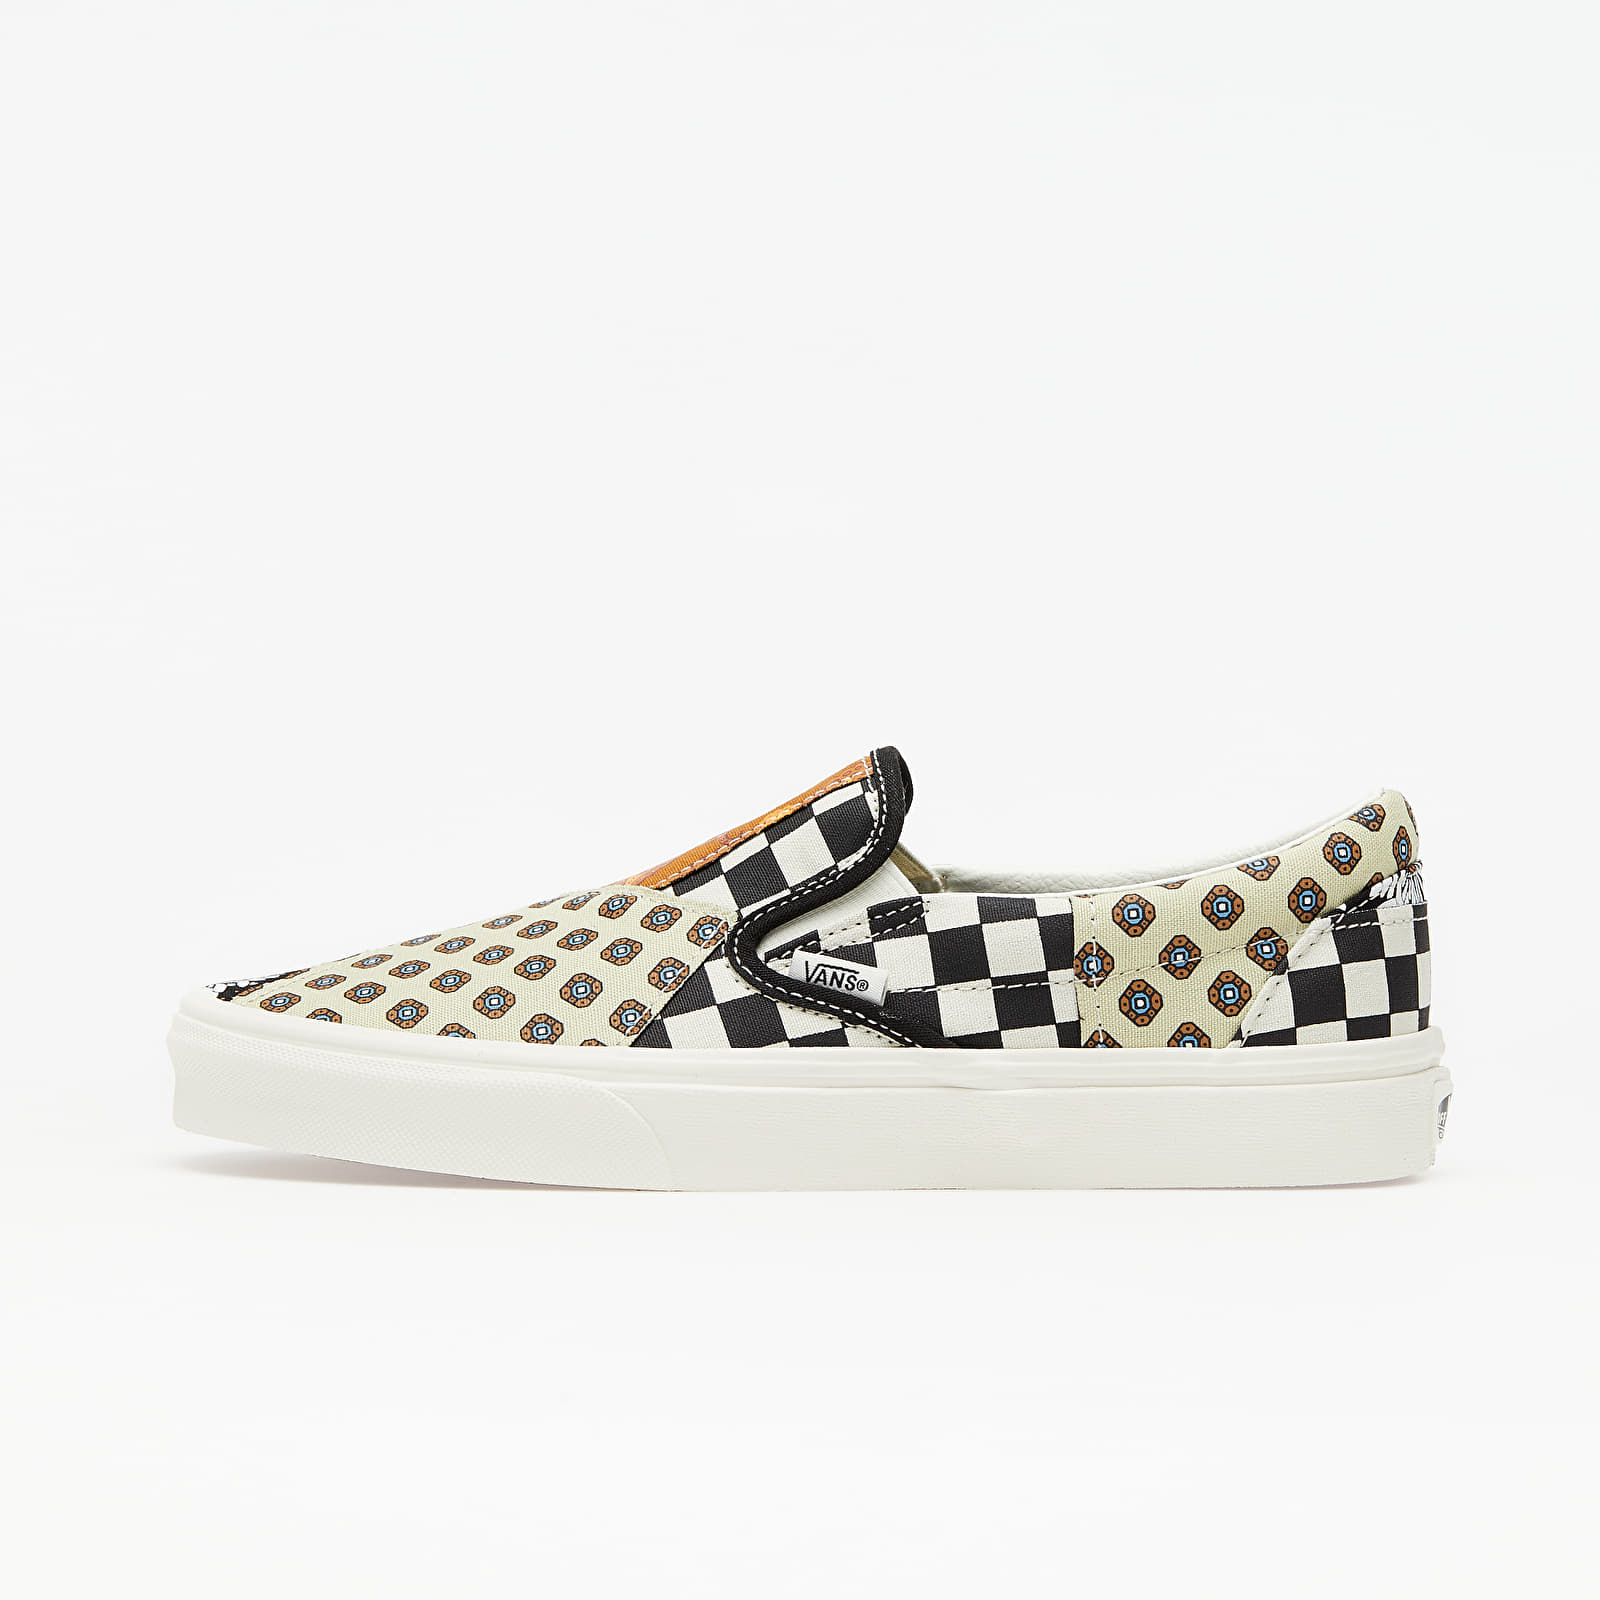 Vans Classic Slip On (Tiger Patchwork) Black True White | Footshop